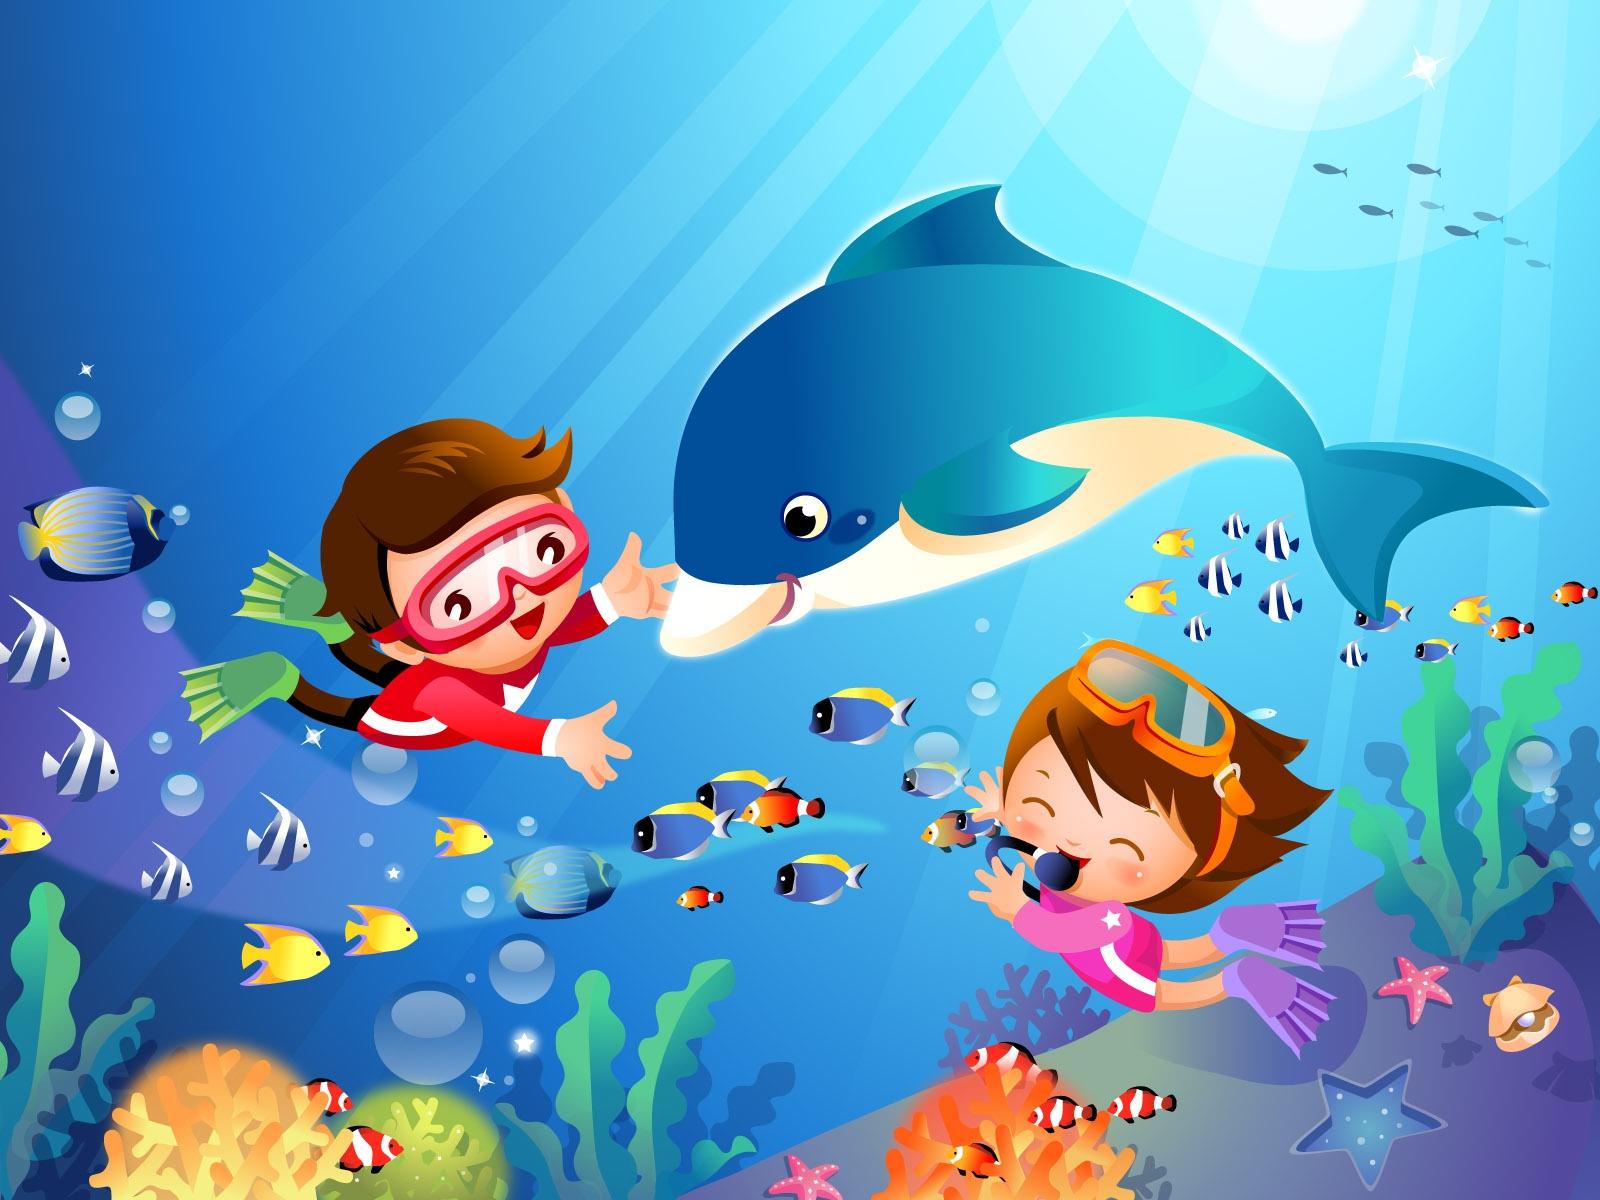 Hd 1600x1200 Sweet Children Time Desktop Wallpapers Backgrounds 1600x1200